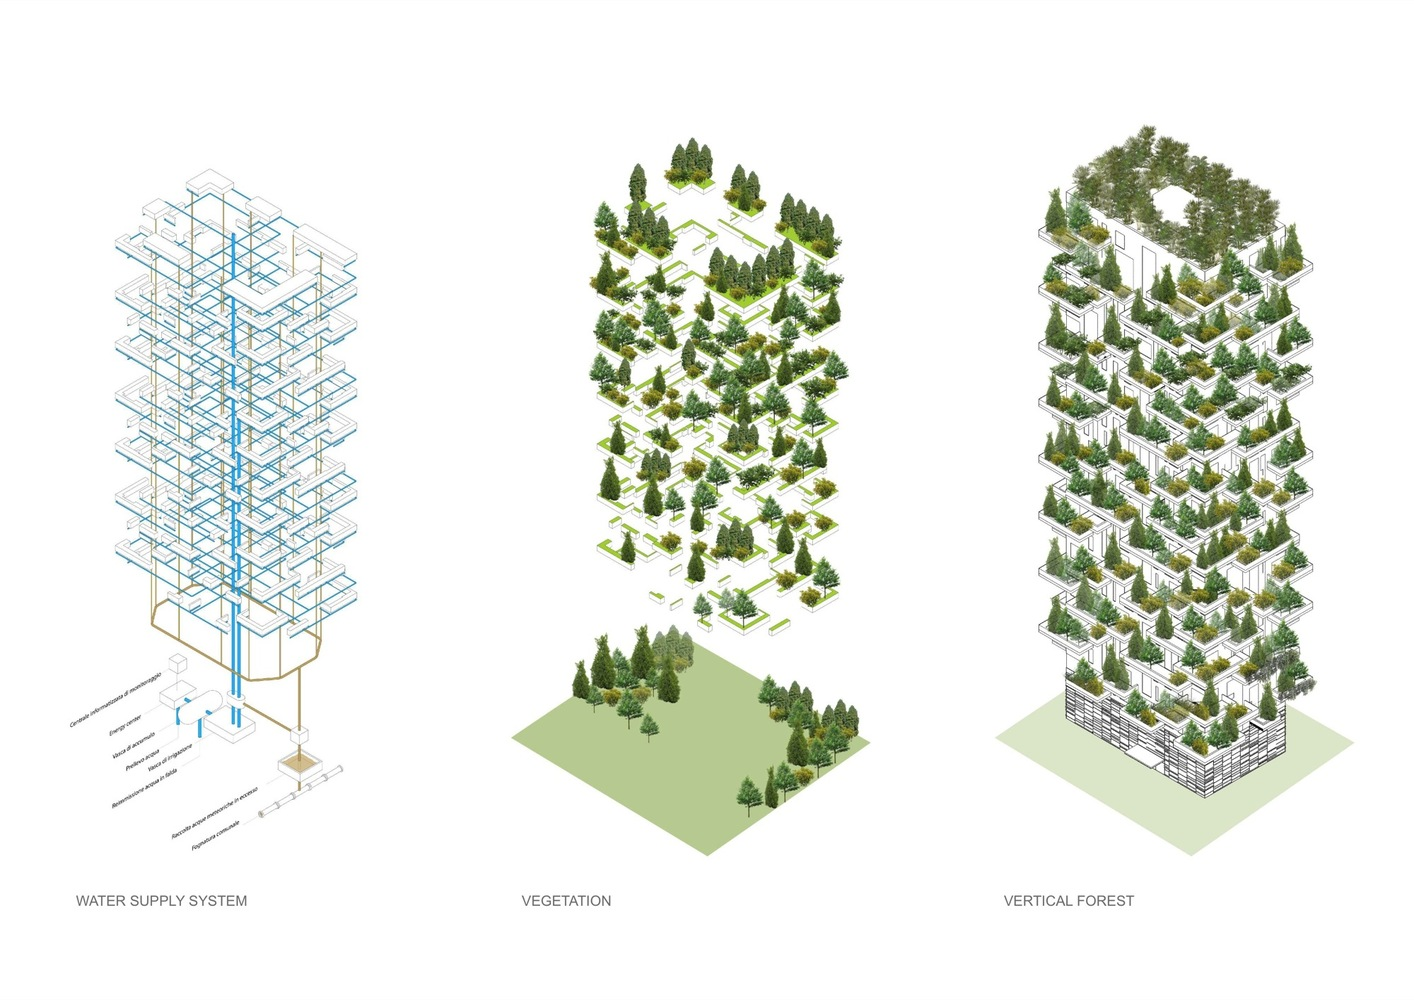 Il Bosco Verticale struktur